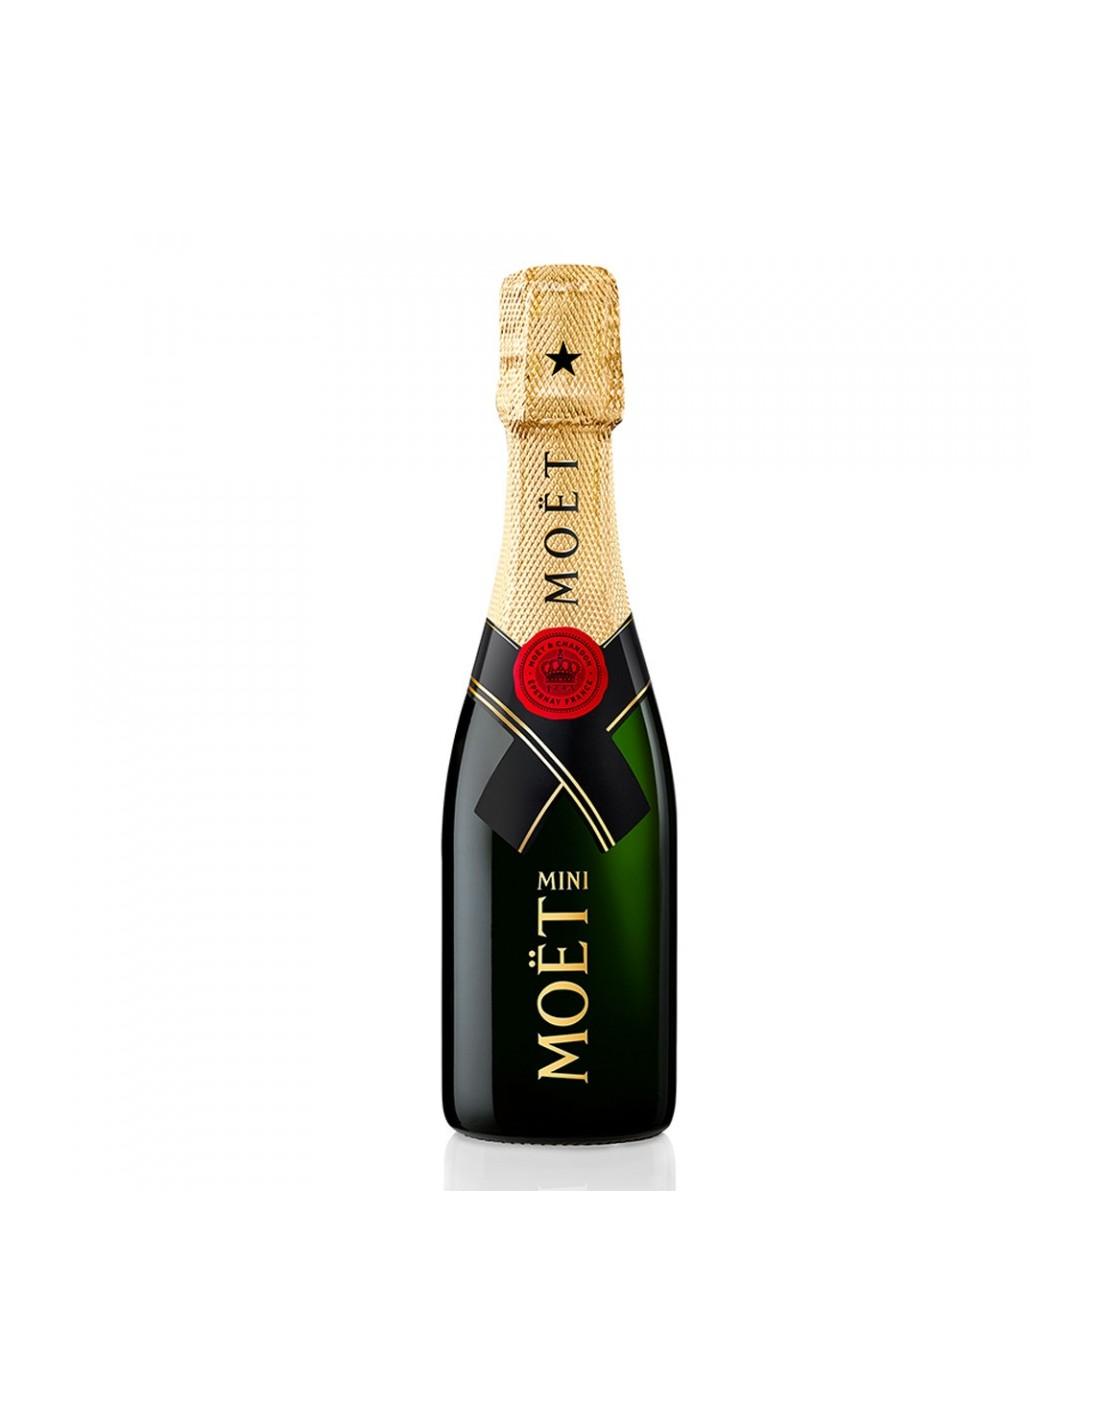 Sampanie Moët & Chandon Brut Imperial Champagne, 0.2L, 12% alc., Franta